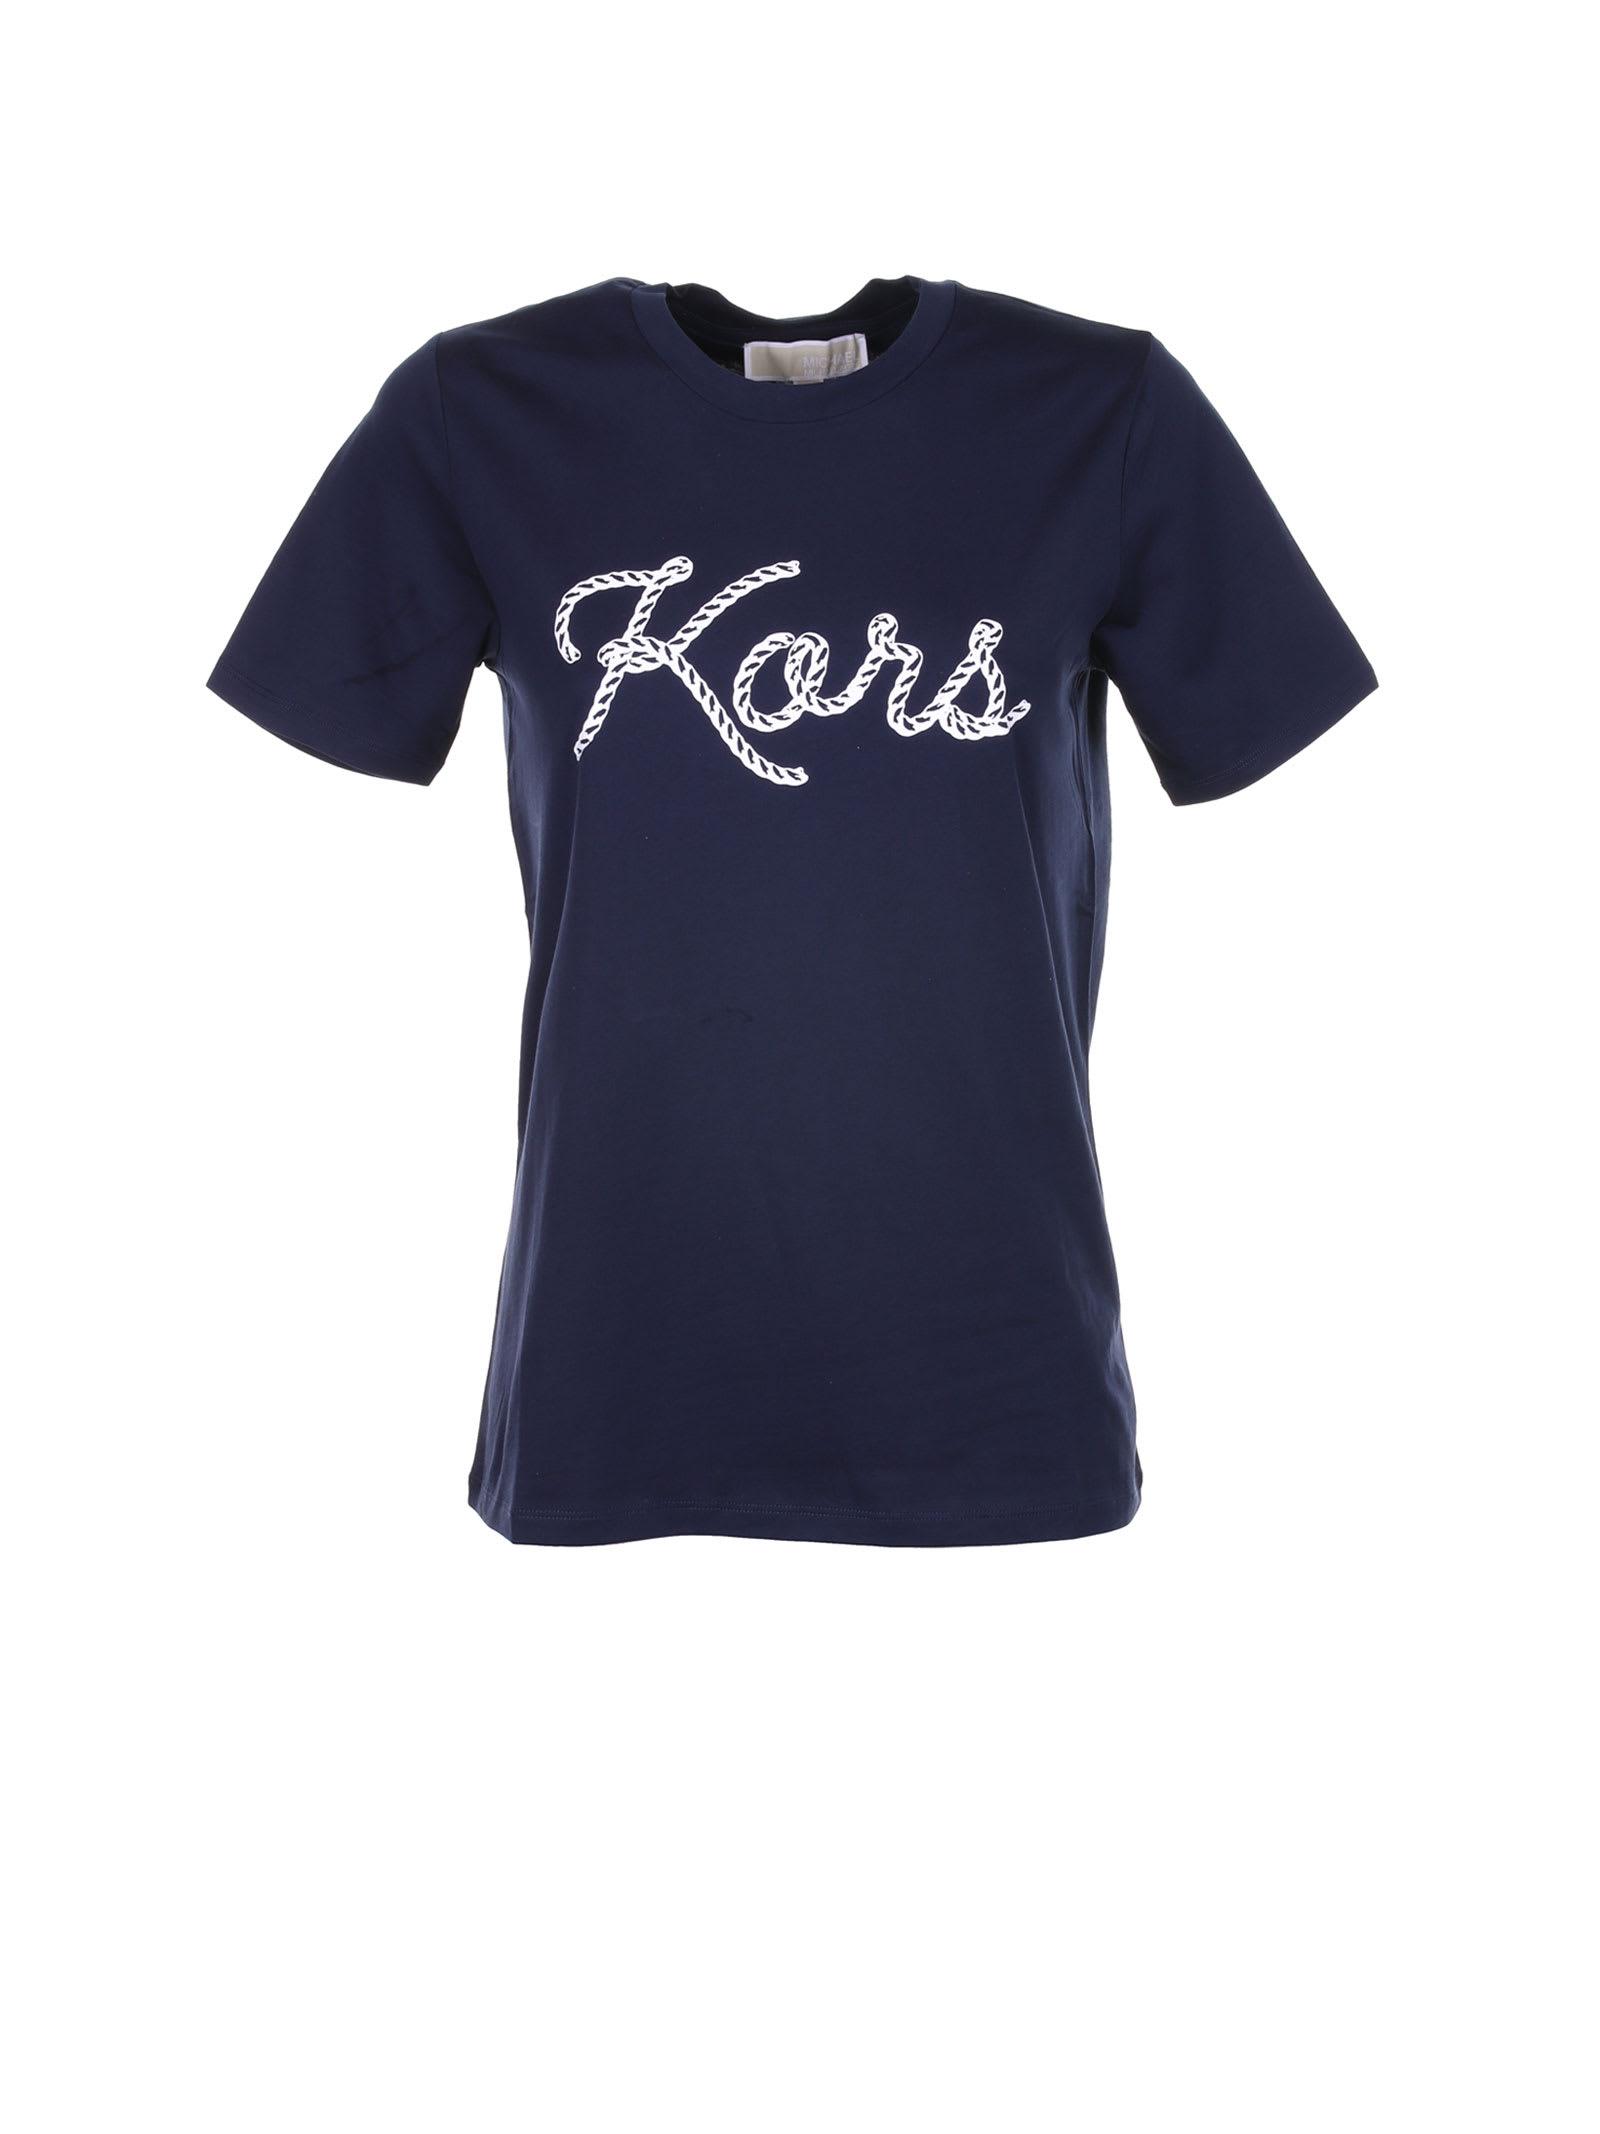 Michael Kors T-shirts T-SHIRT